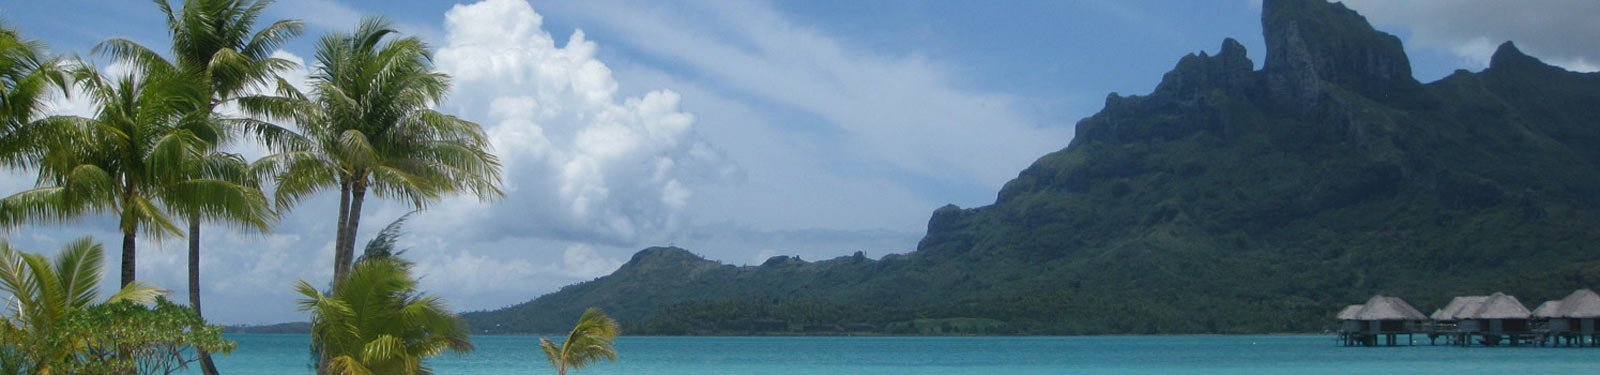 10 Amazing Things to Do in Bora Bora